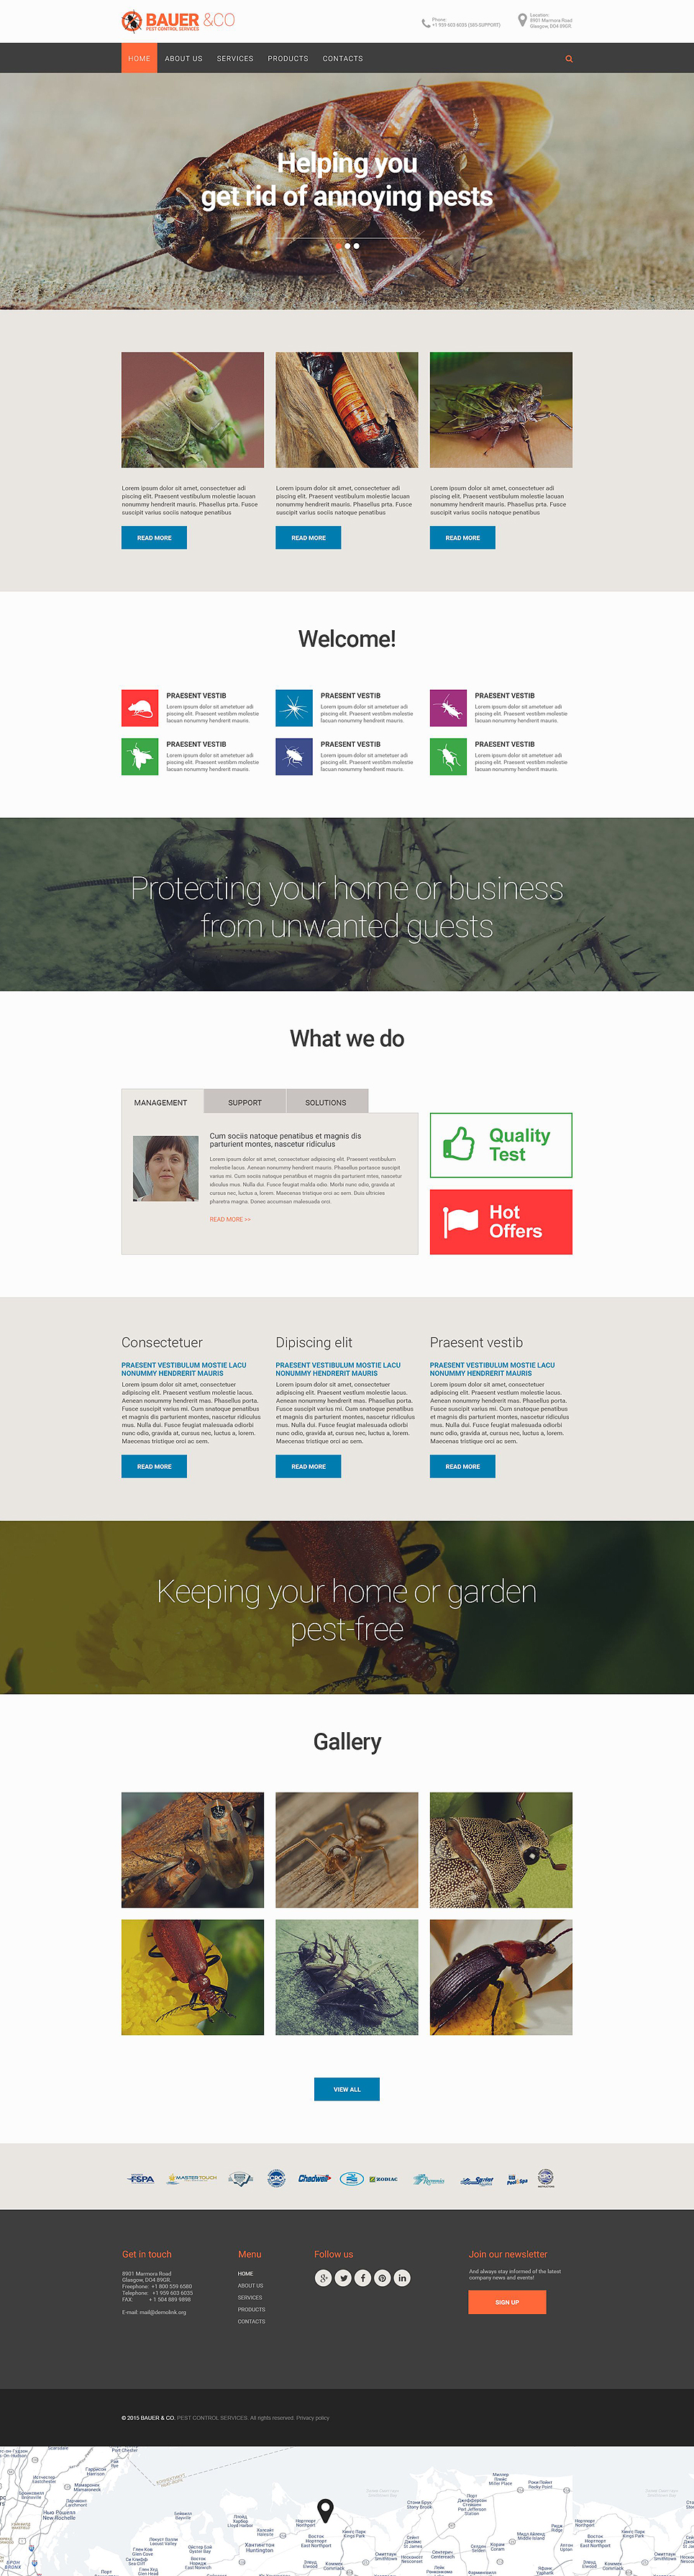 pest control responsive website template 55359